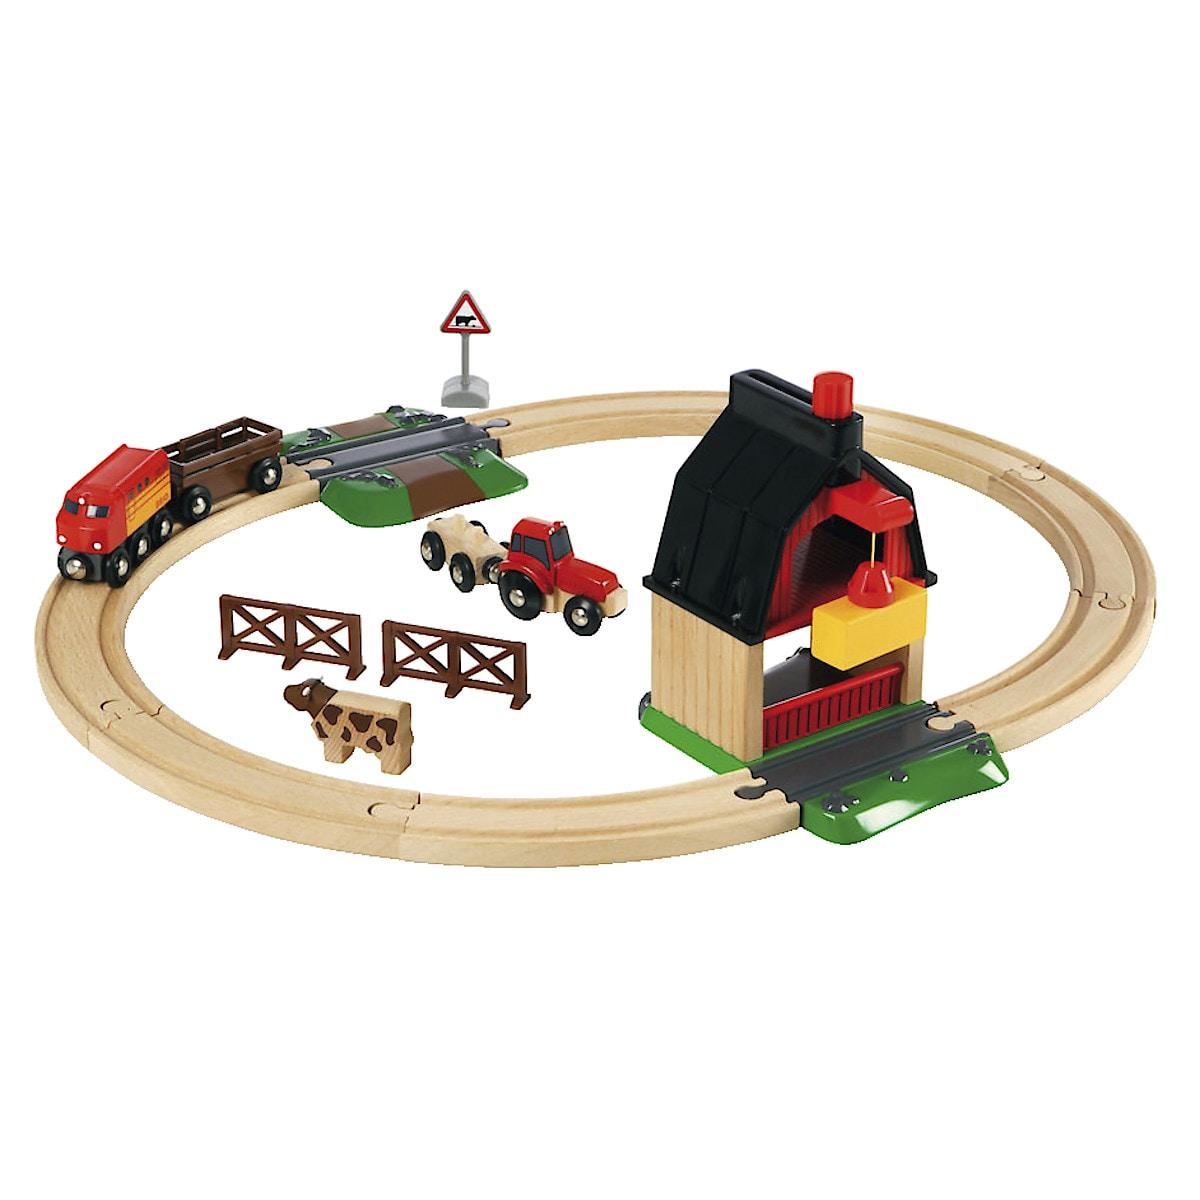 Klassisk togbane, Brio bondegård